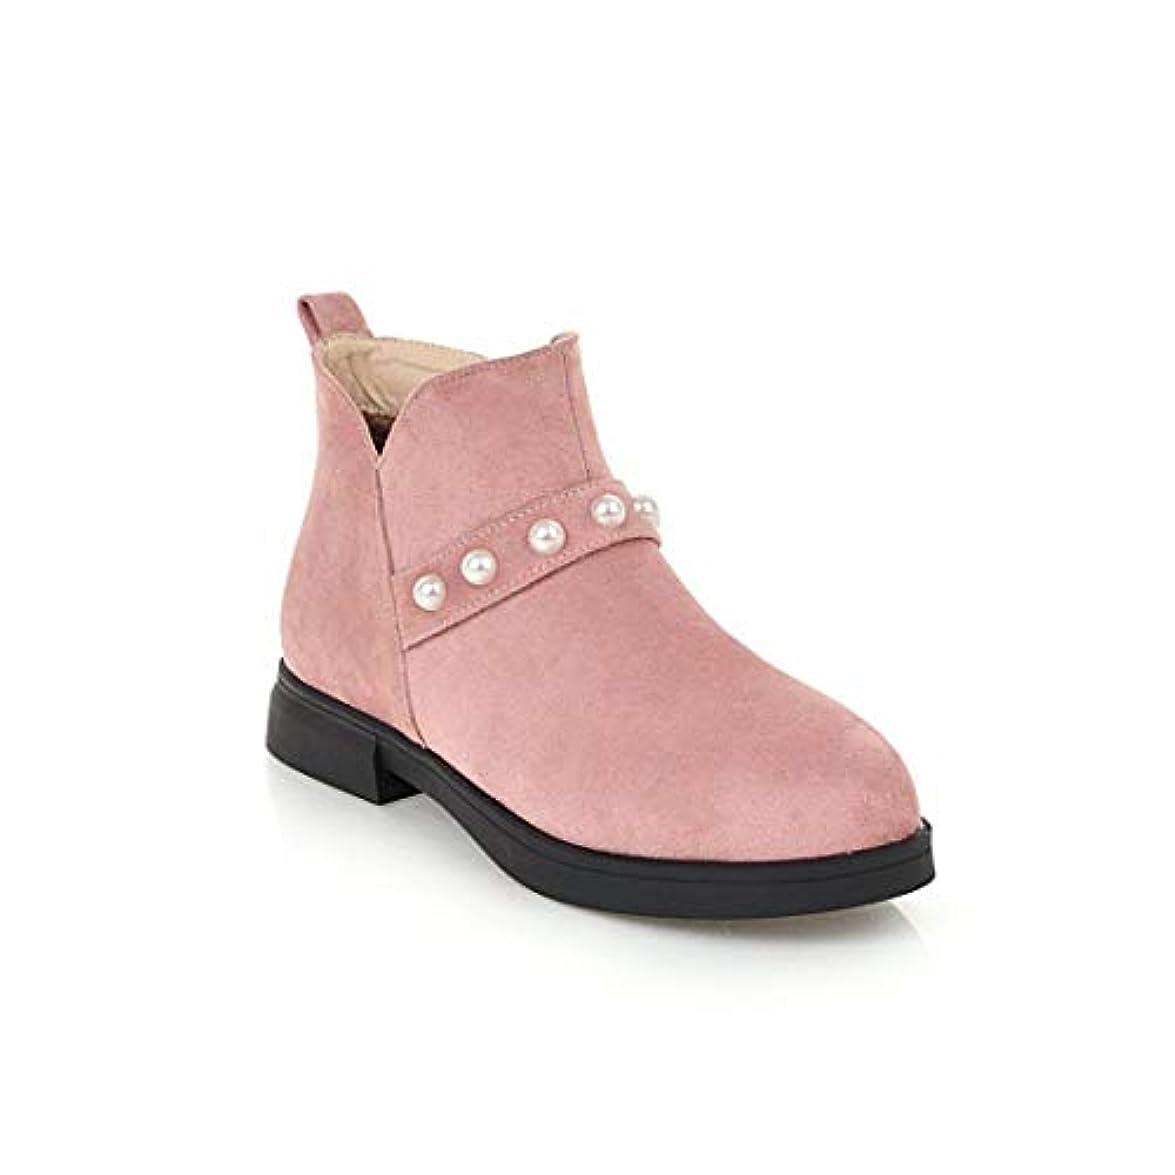 Stivali Da Donna scarpe Casual nbsp;scarpe A Tacco Basso nbsp;stivali Scoperti Selvaggi